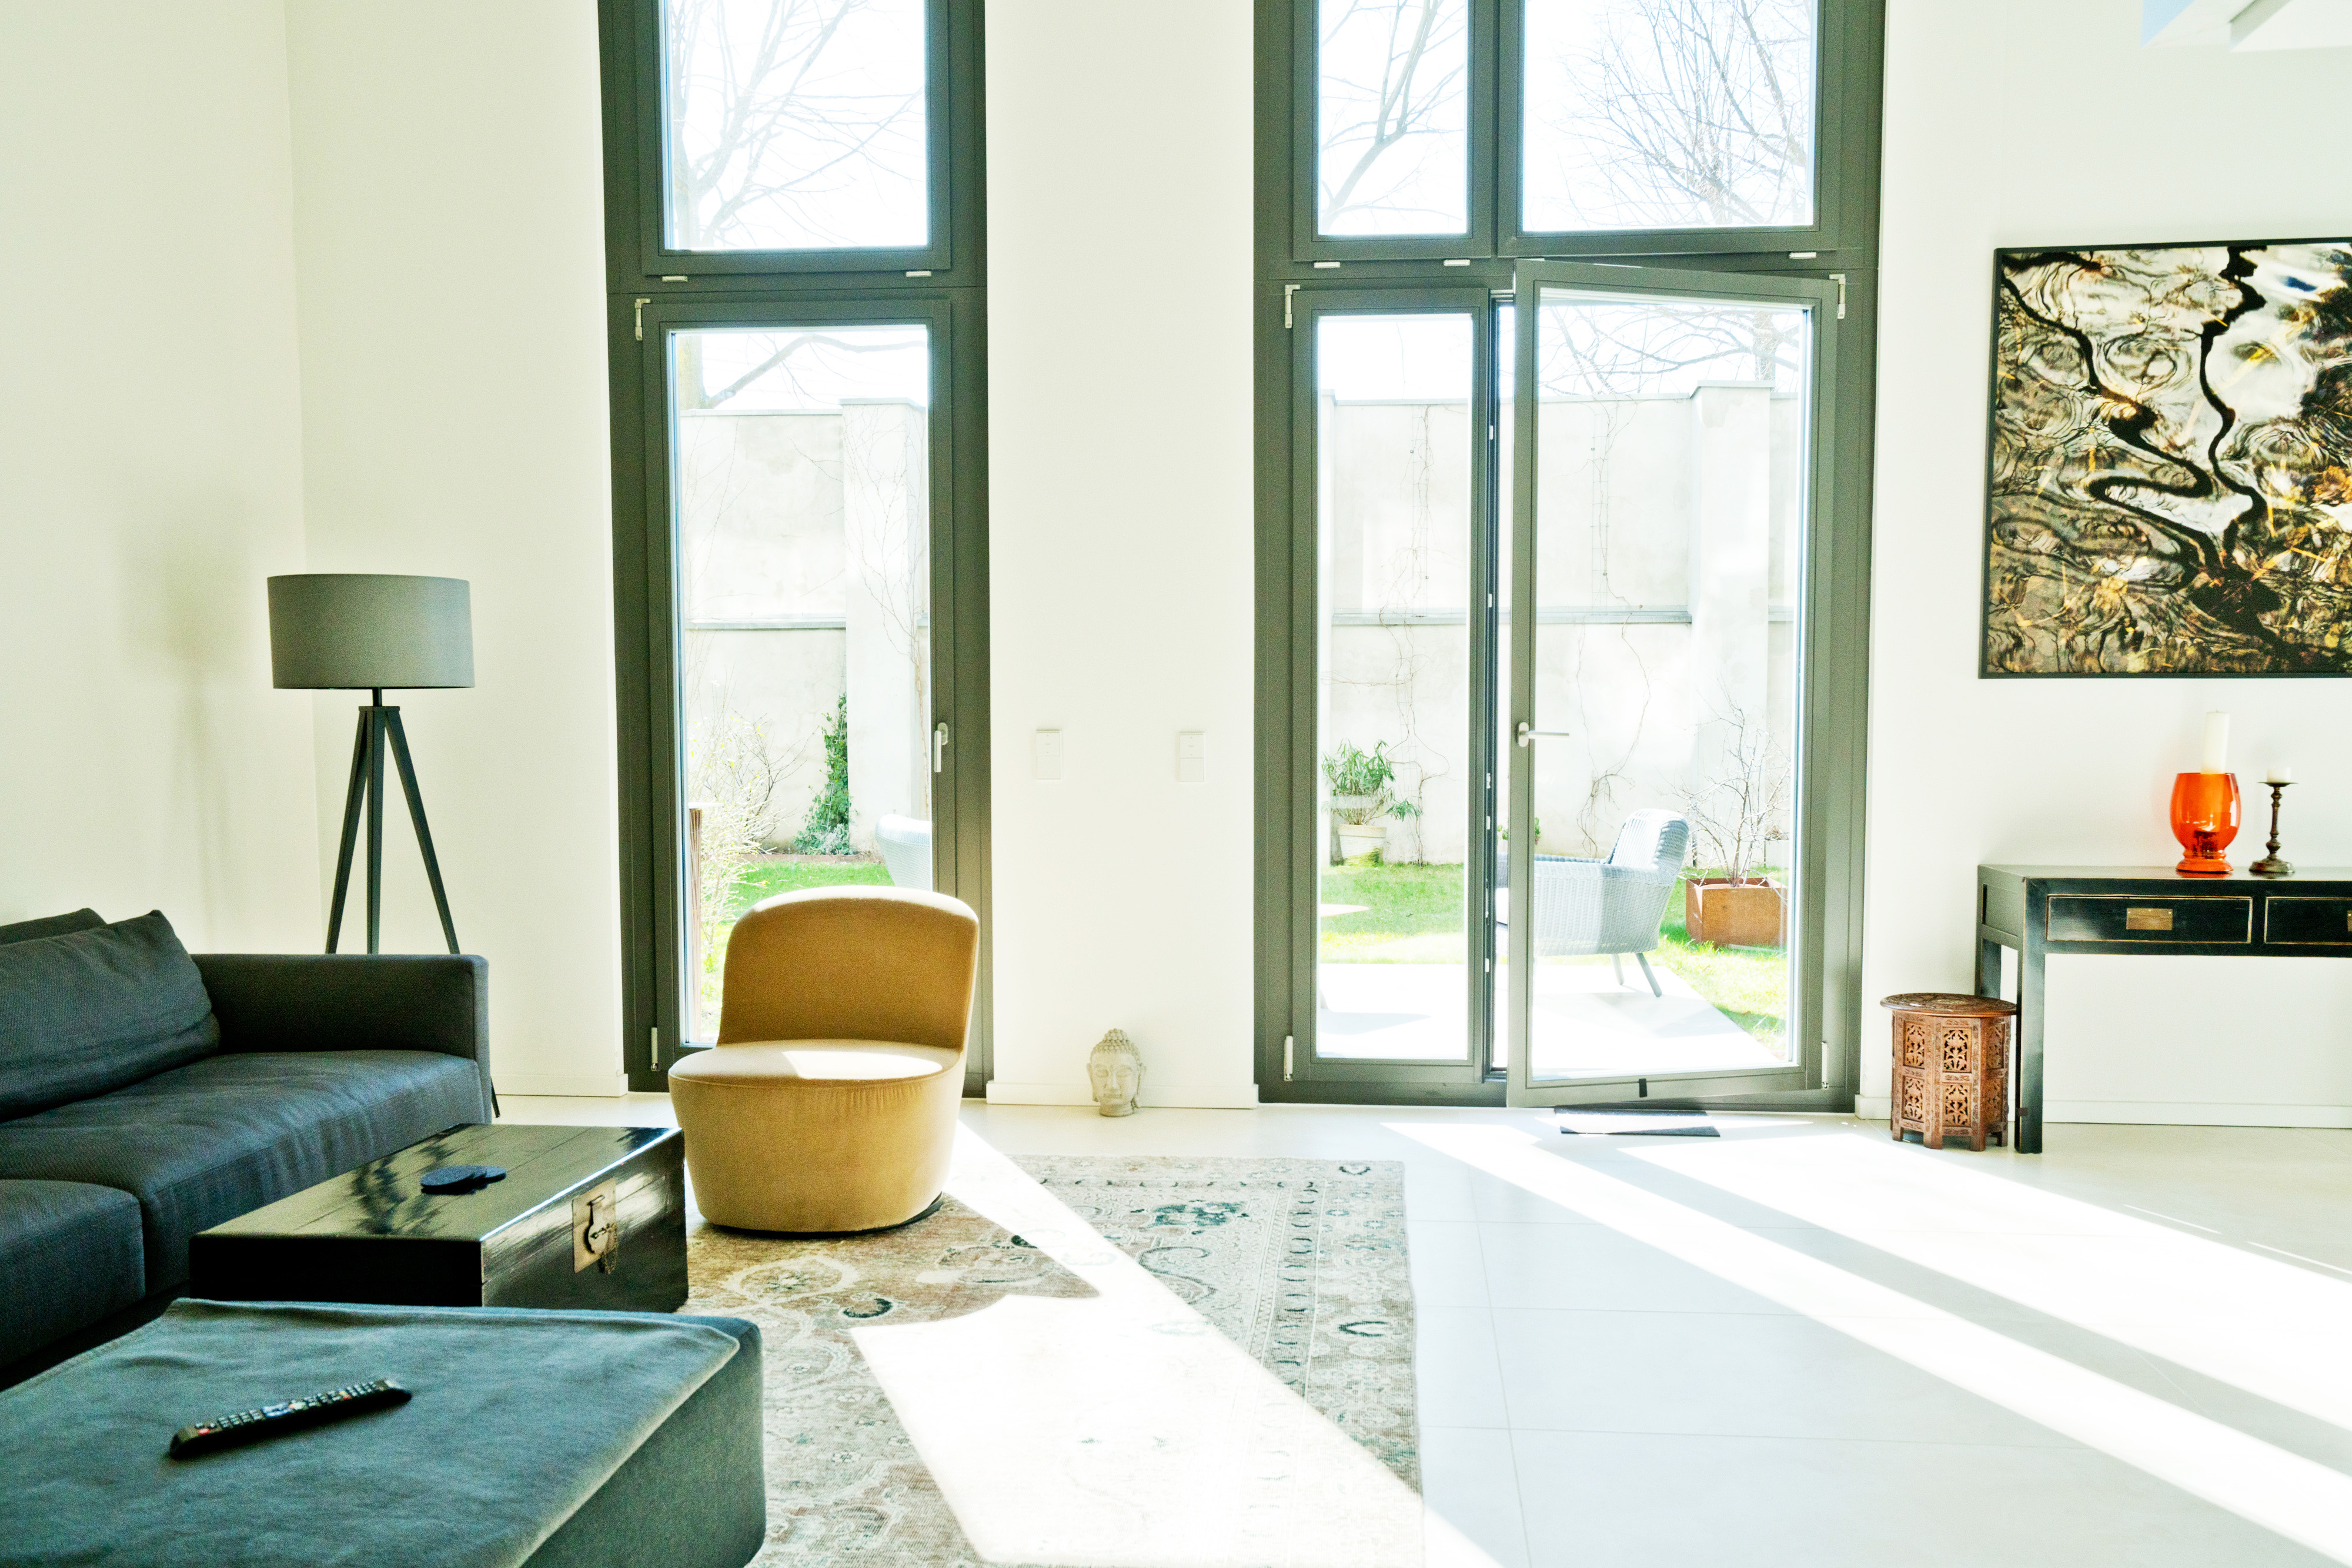 Berühmt Beste Cv Gebäude App Bilder - Entry Level Resume Vorlagen ...